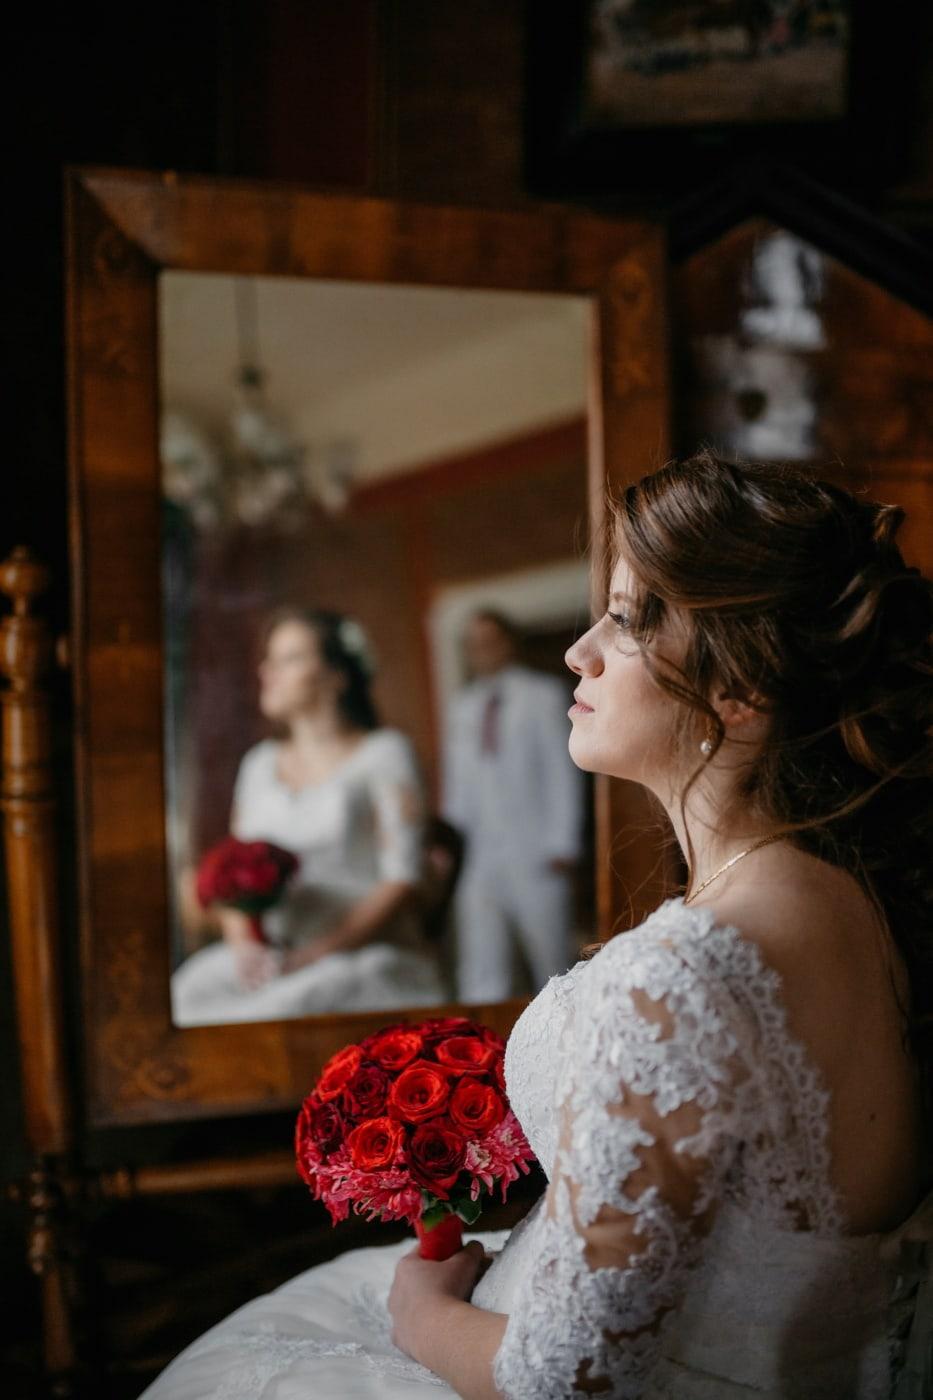 lady, brunette, gorgeous, bride, salon, sitting, wedding, woman, people, love